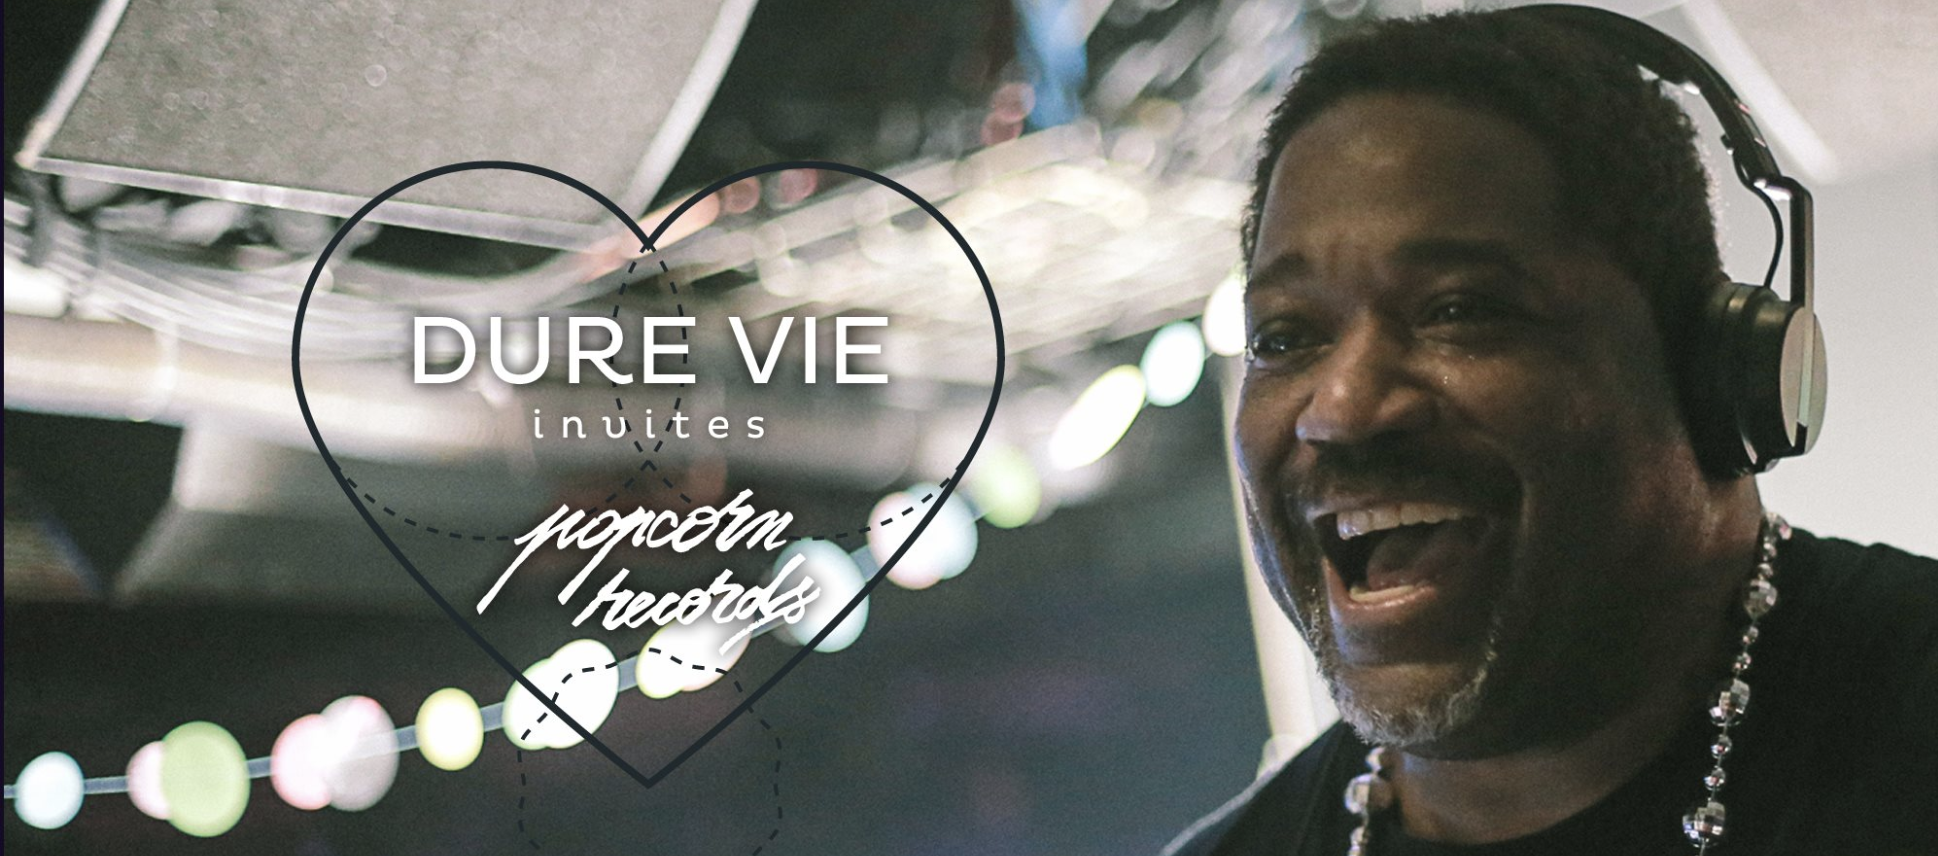 Dure Vie x Popcorn 8 Years • Chez Damier ~ DJ Gregory ~ Siler